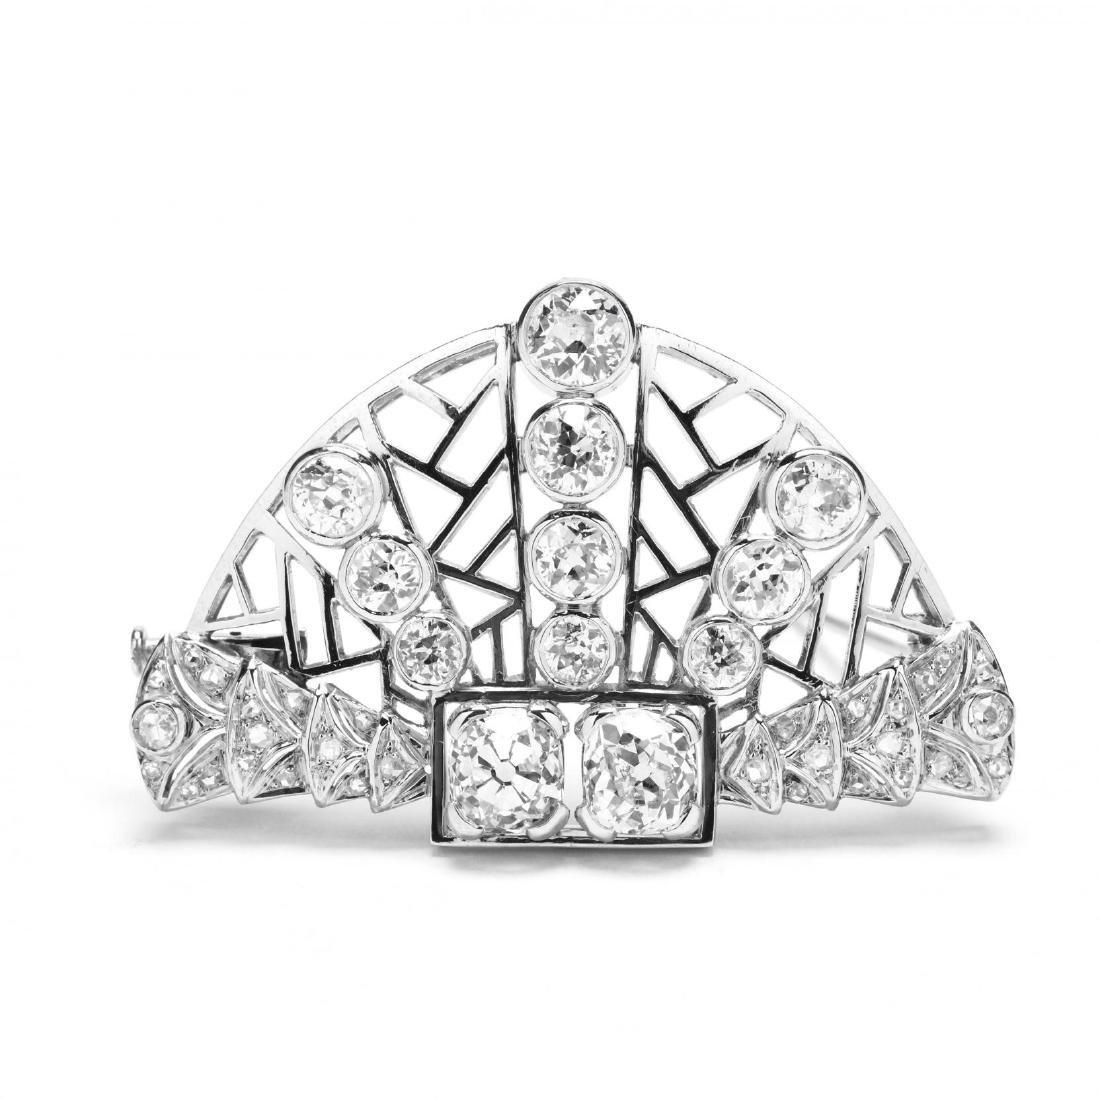 Antique Platinum and Diamond Brooch, Janesich - 3